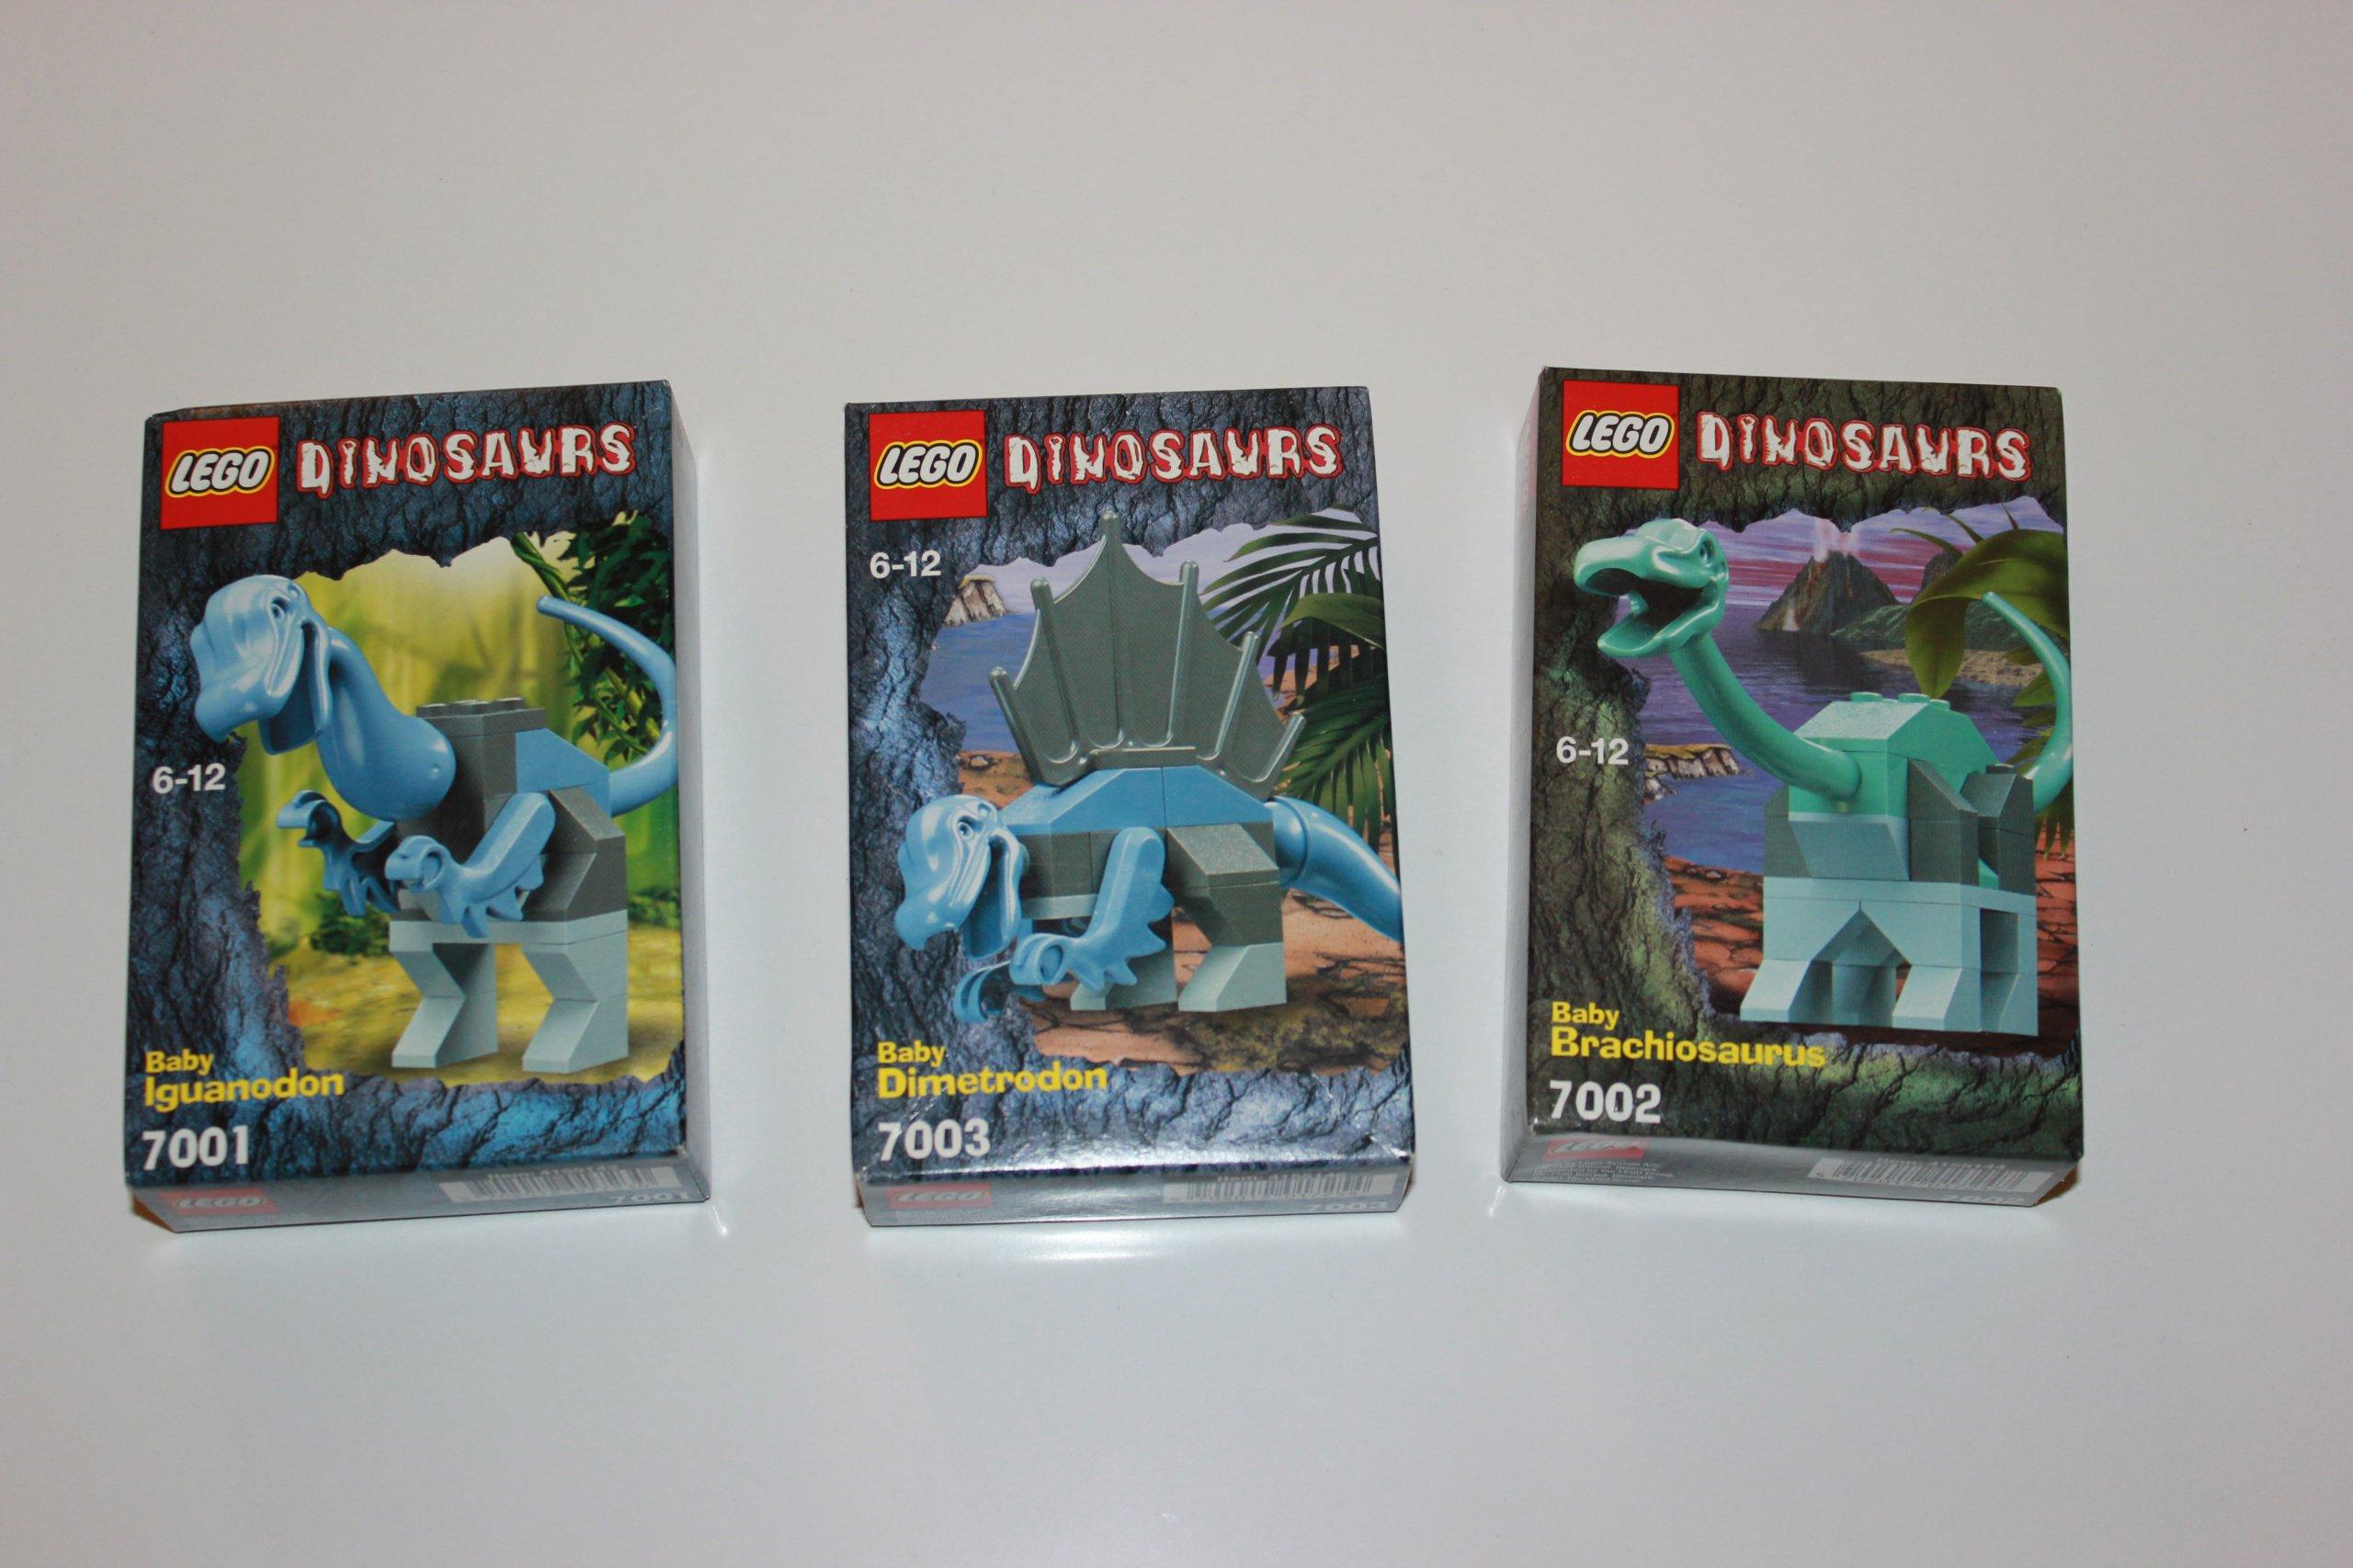 LEGO DINOSAURS 7001, 7002, 7003 NOWE